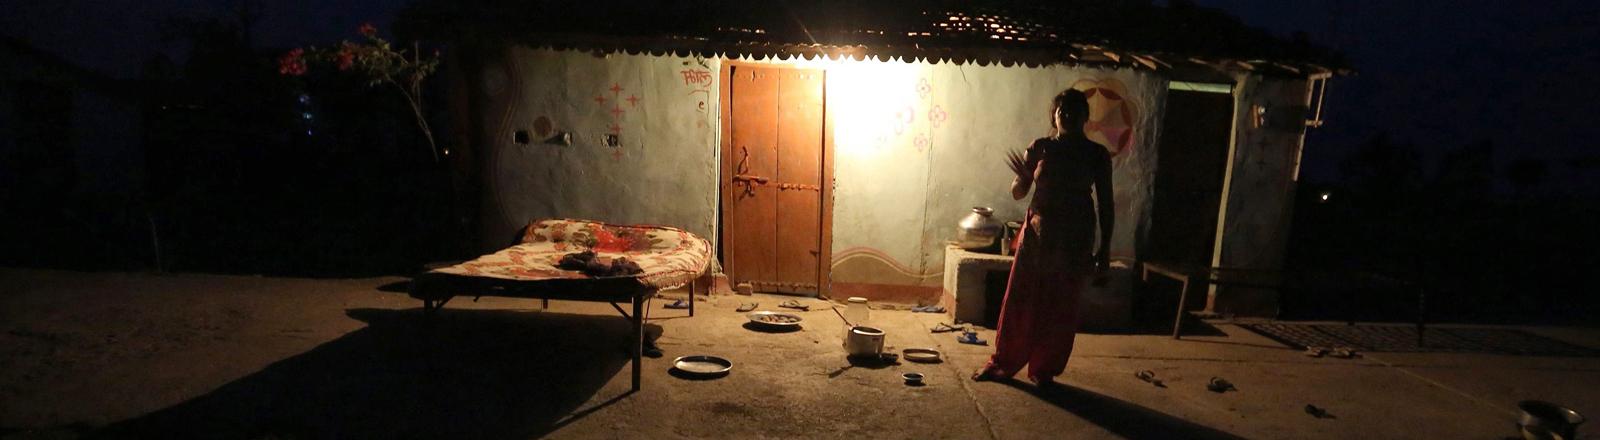 Prostituierte in Indien. dpa